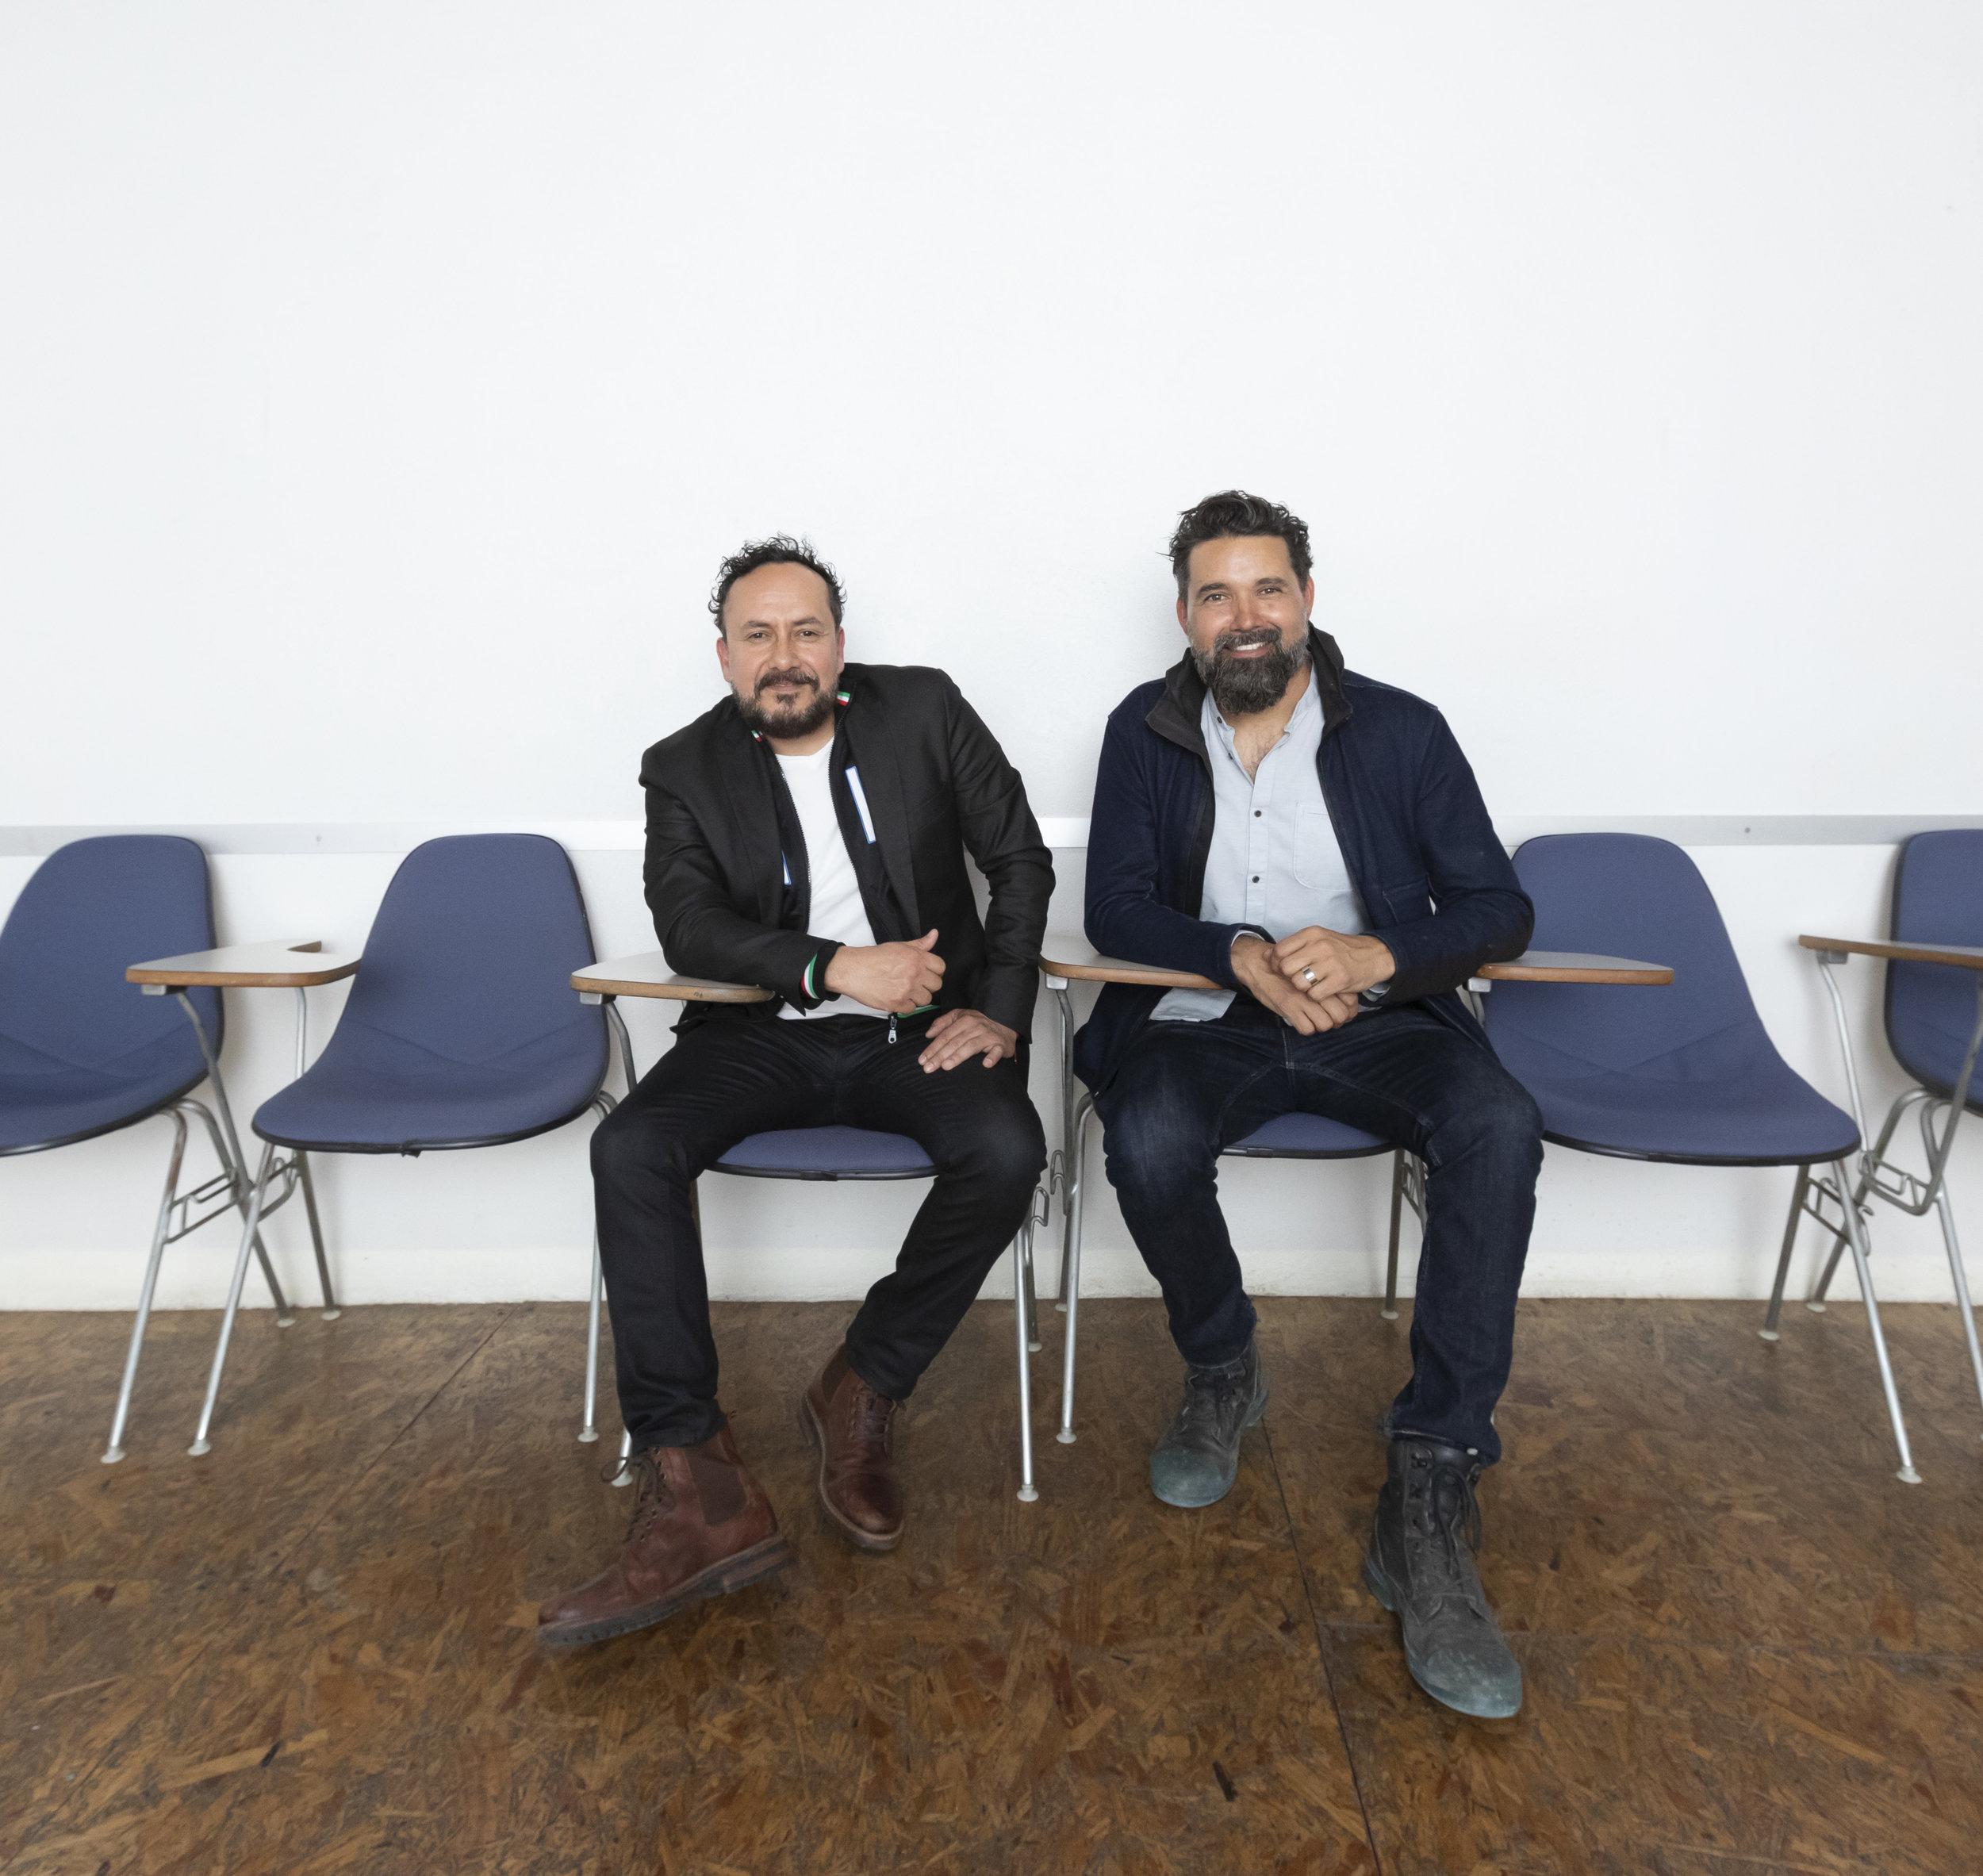 Aaron Gutierrez and Jorge Gracia